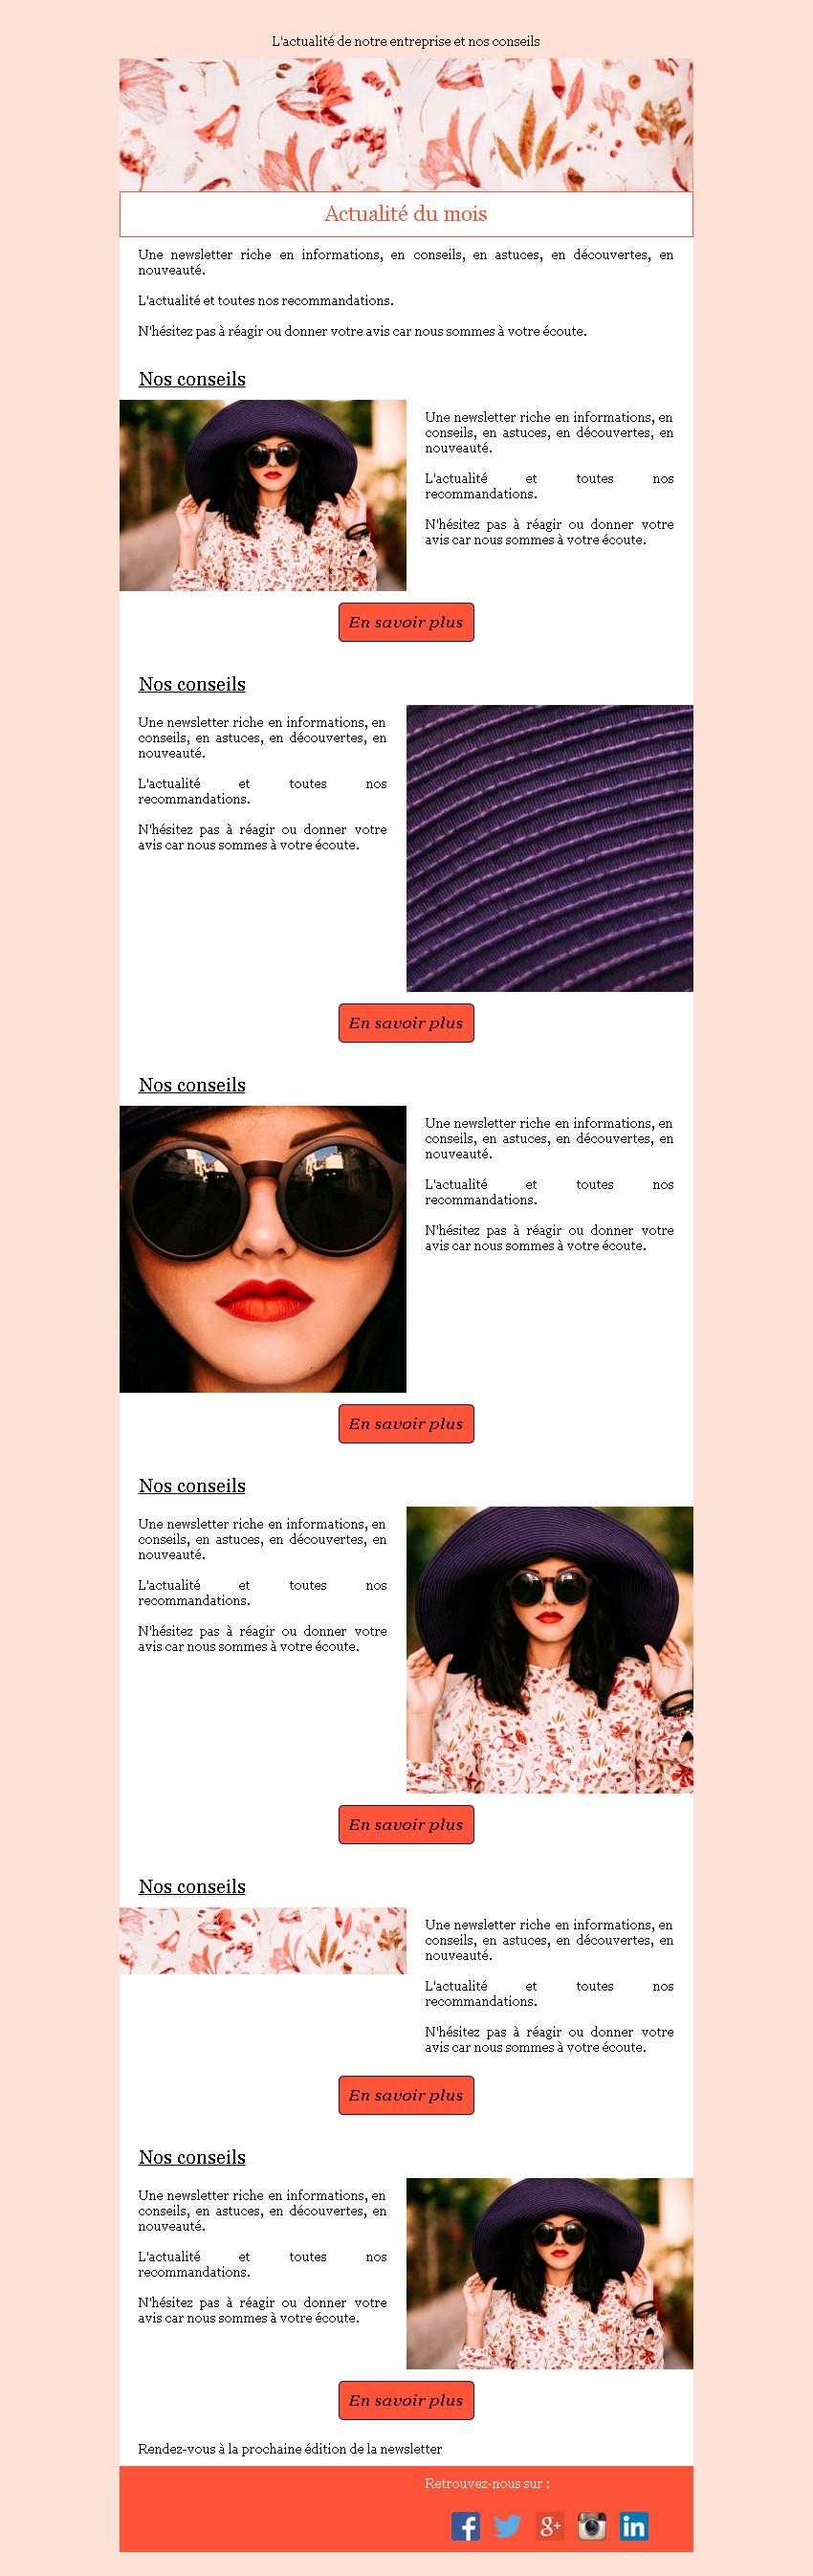 Newsletter mosaïque et bouton